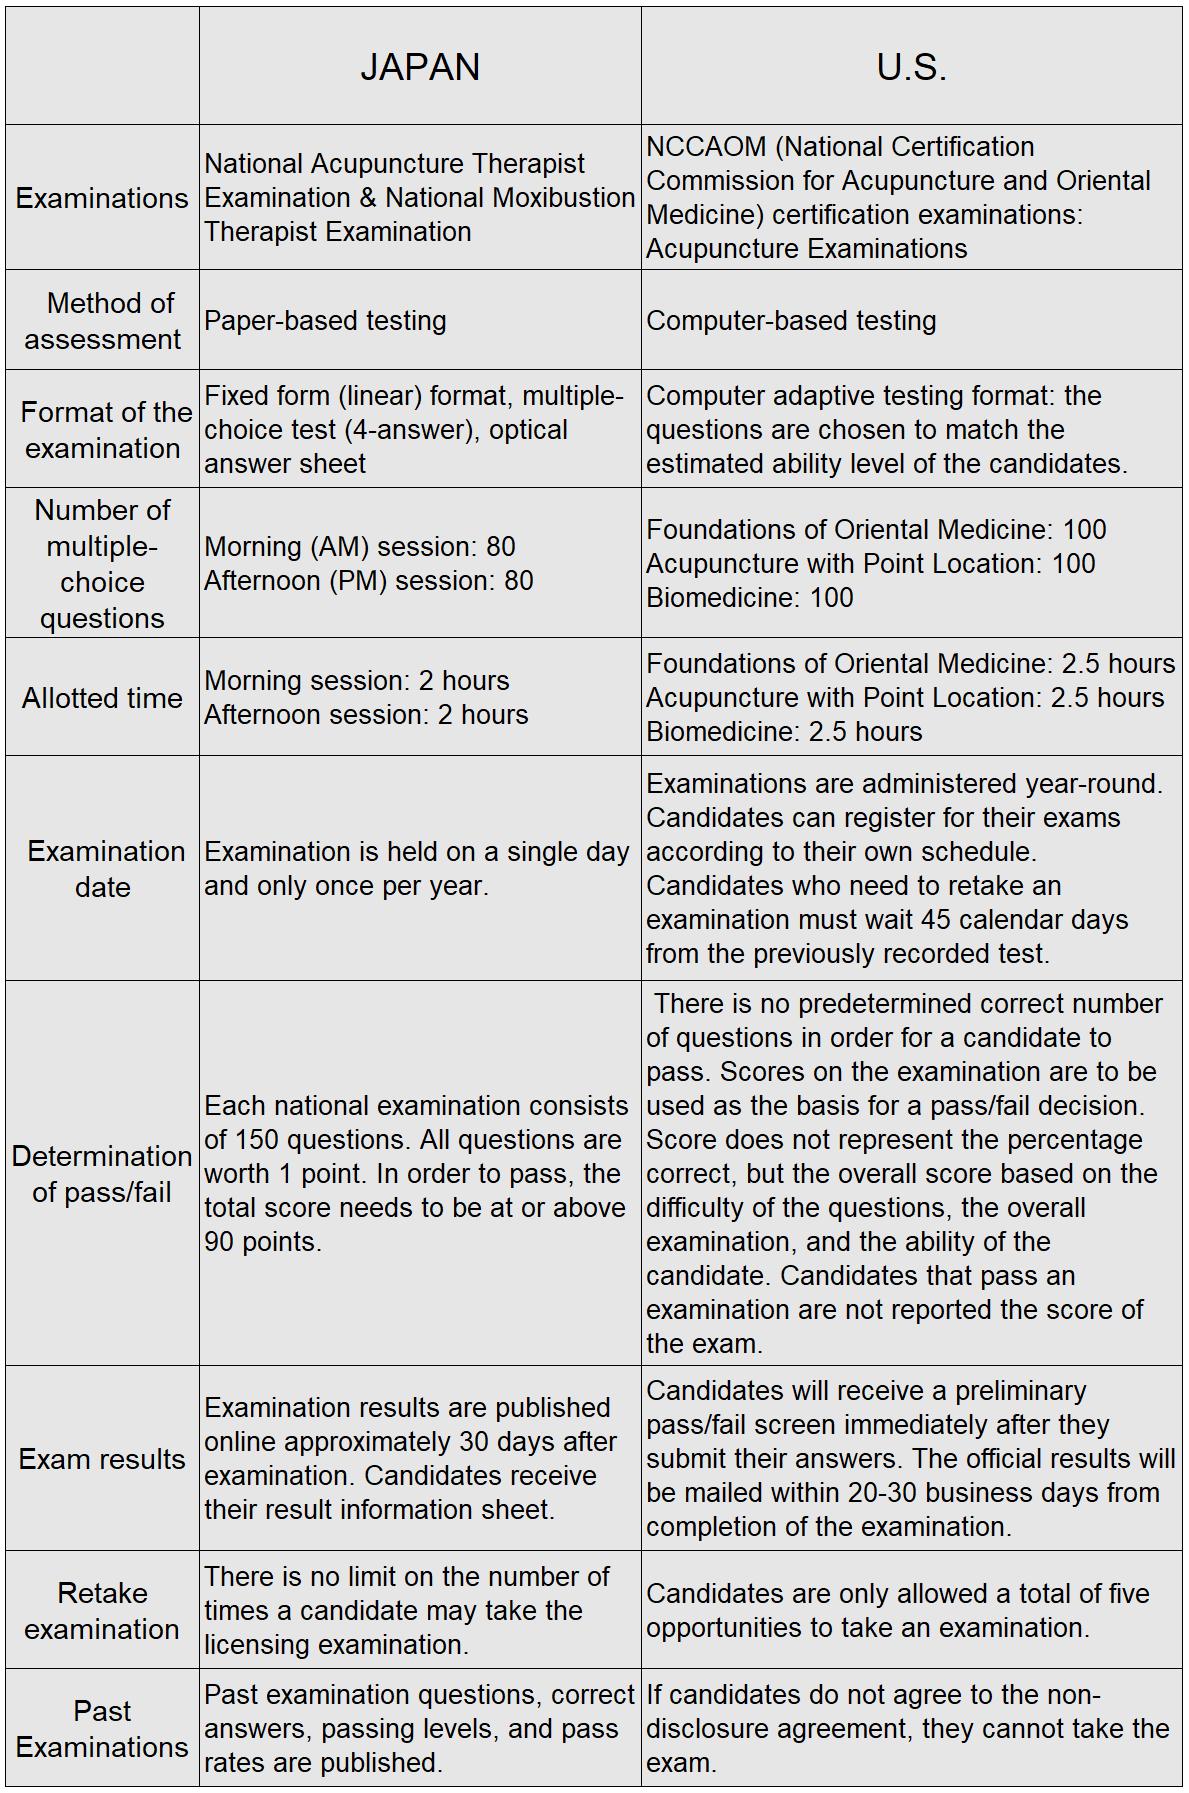 Comparison of Japan and U S  acupuncture | 一般社団法人鍼灸